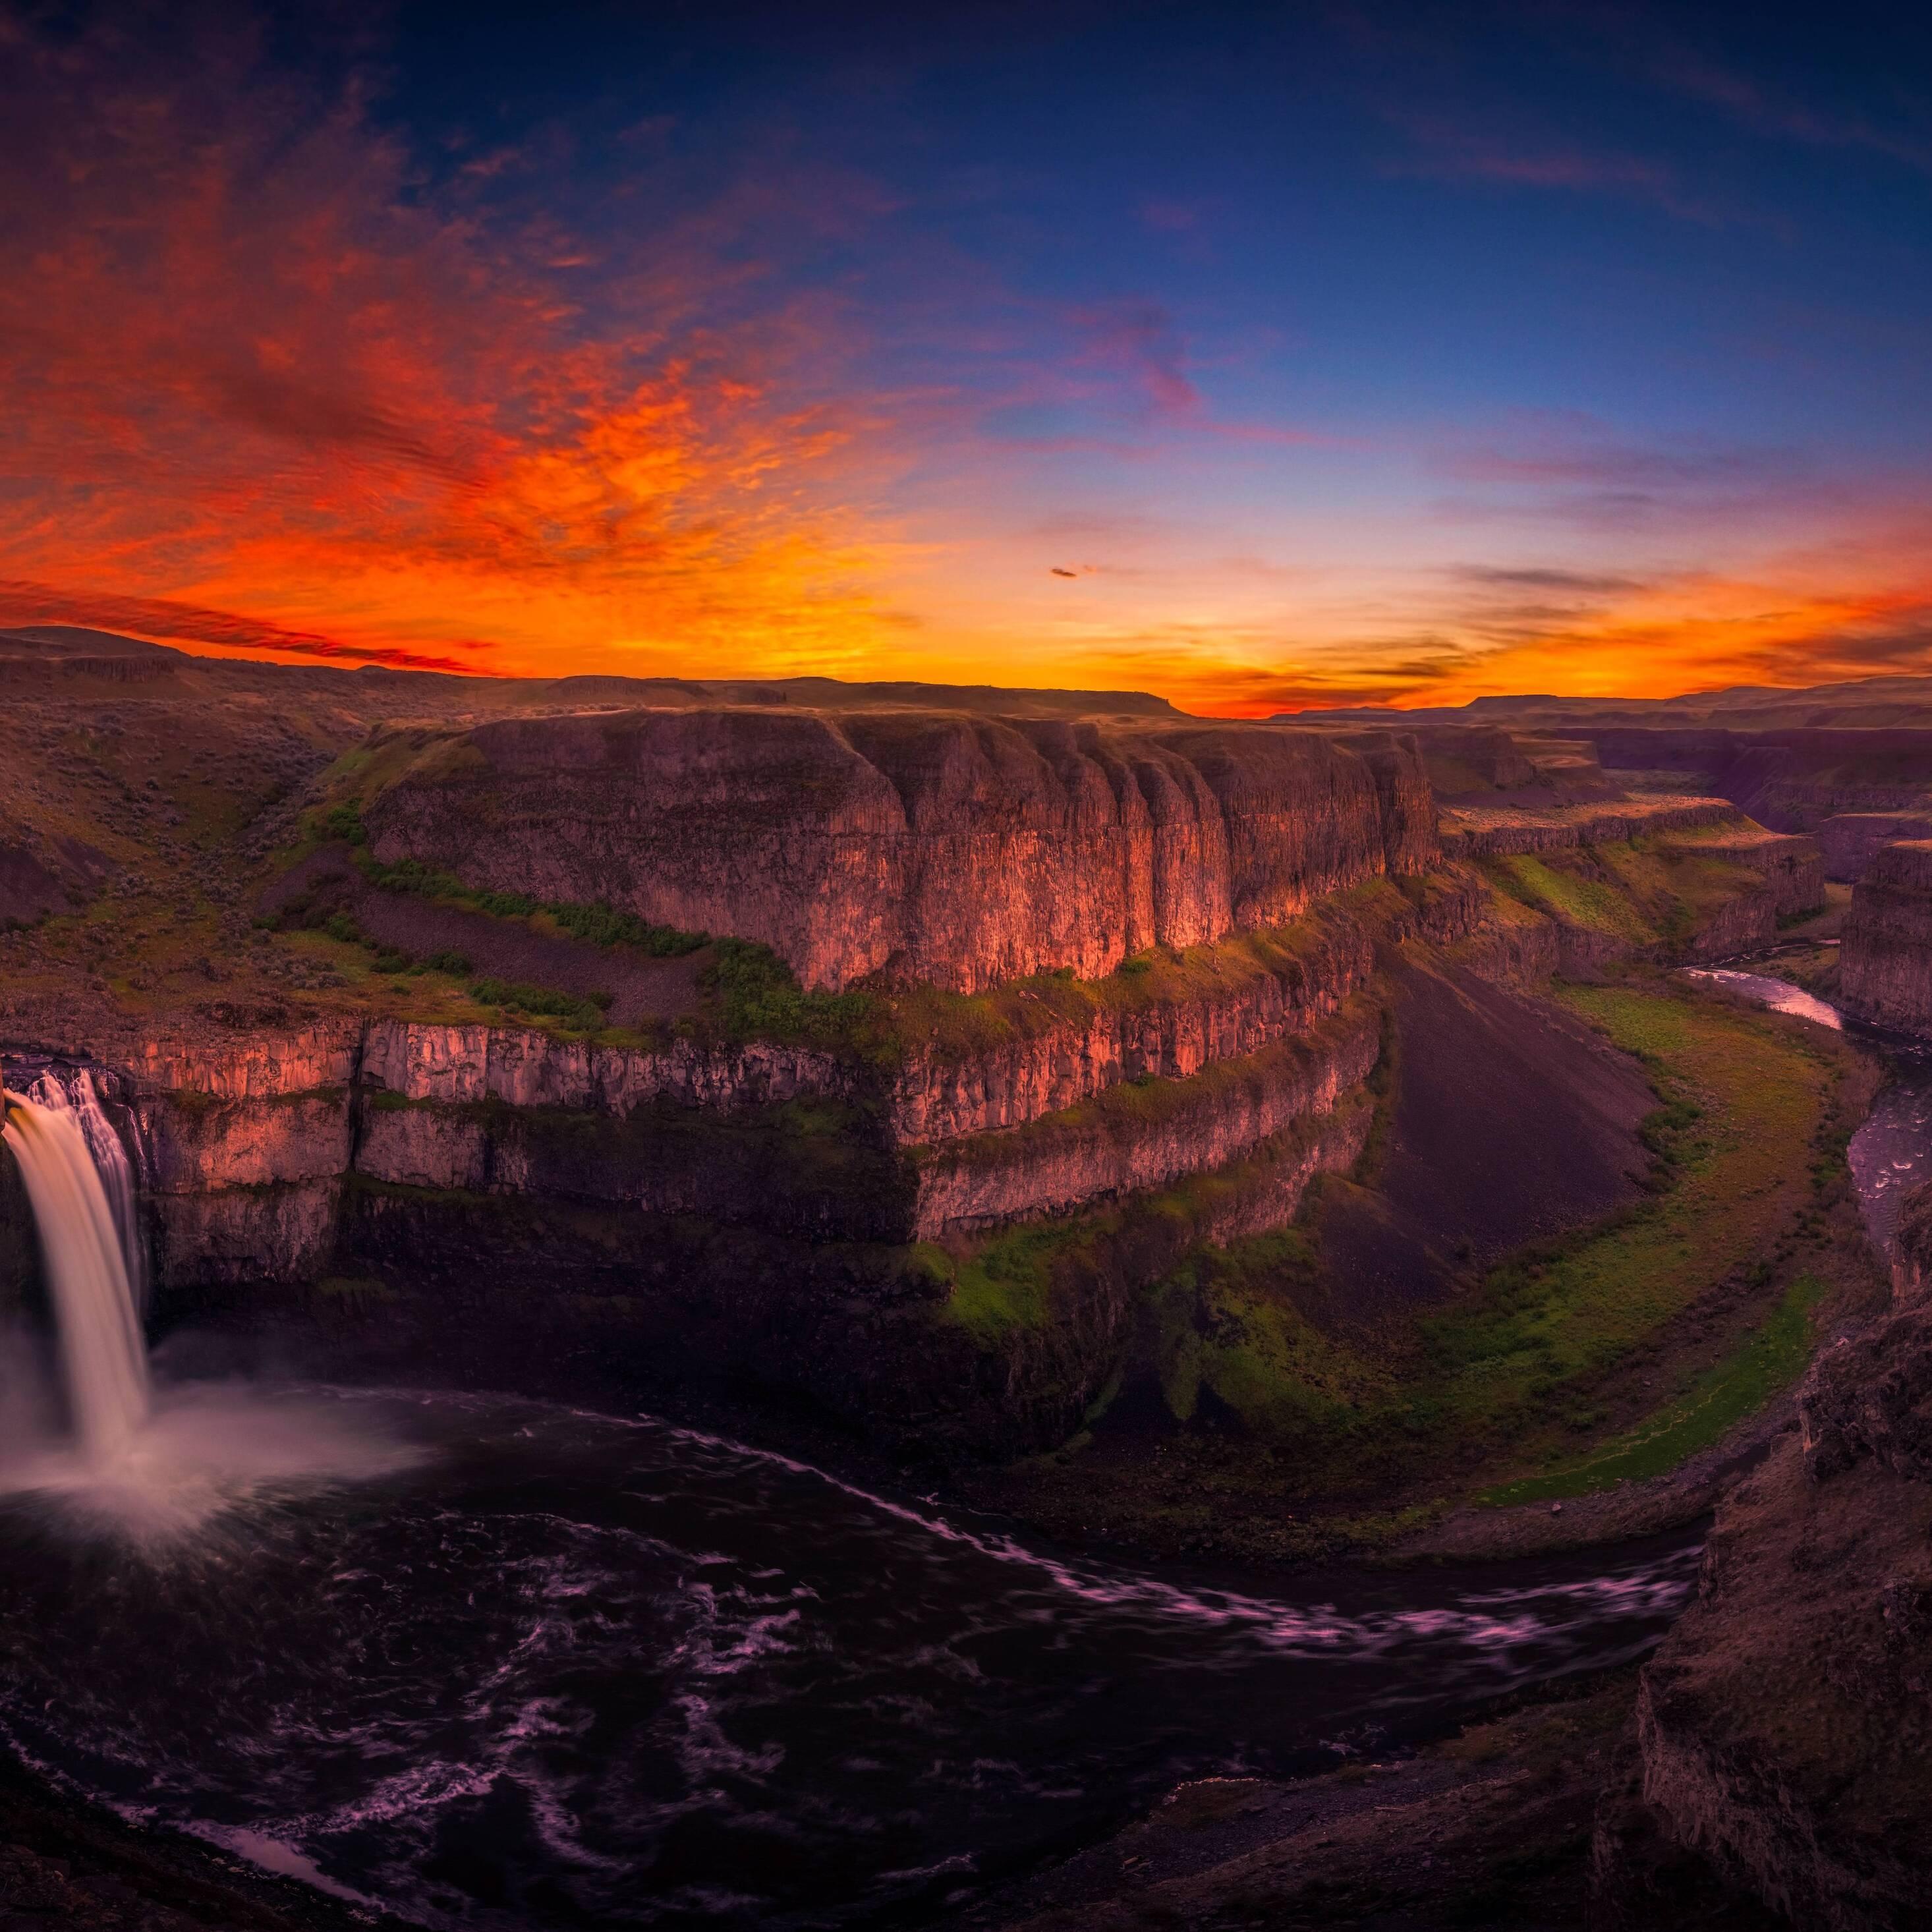 Waterfall Sunset Wallpaper